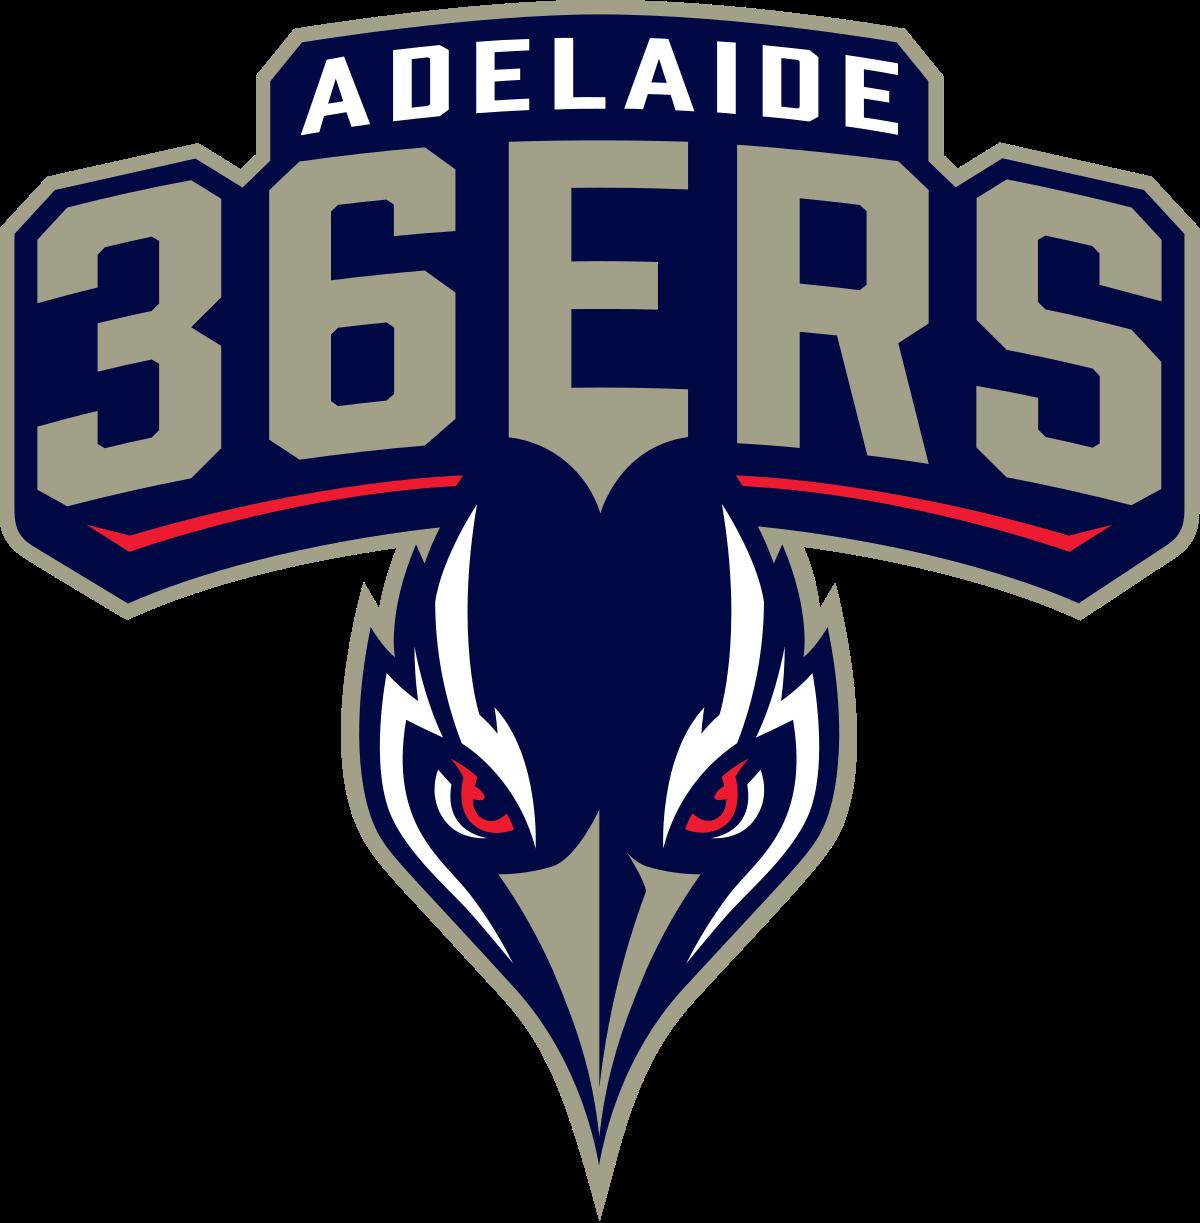 Adelaide 36ers National Basketball League Of Australia Nbl19 Basketball Logo Design Sports Team Logos National Basketball League